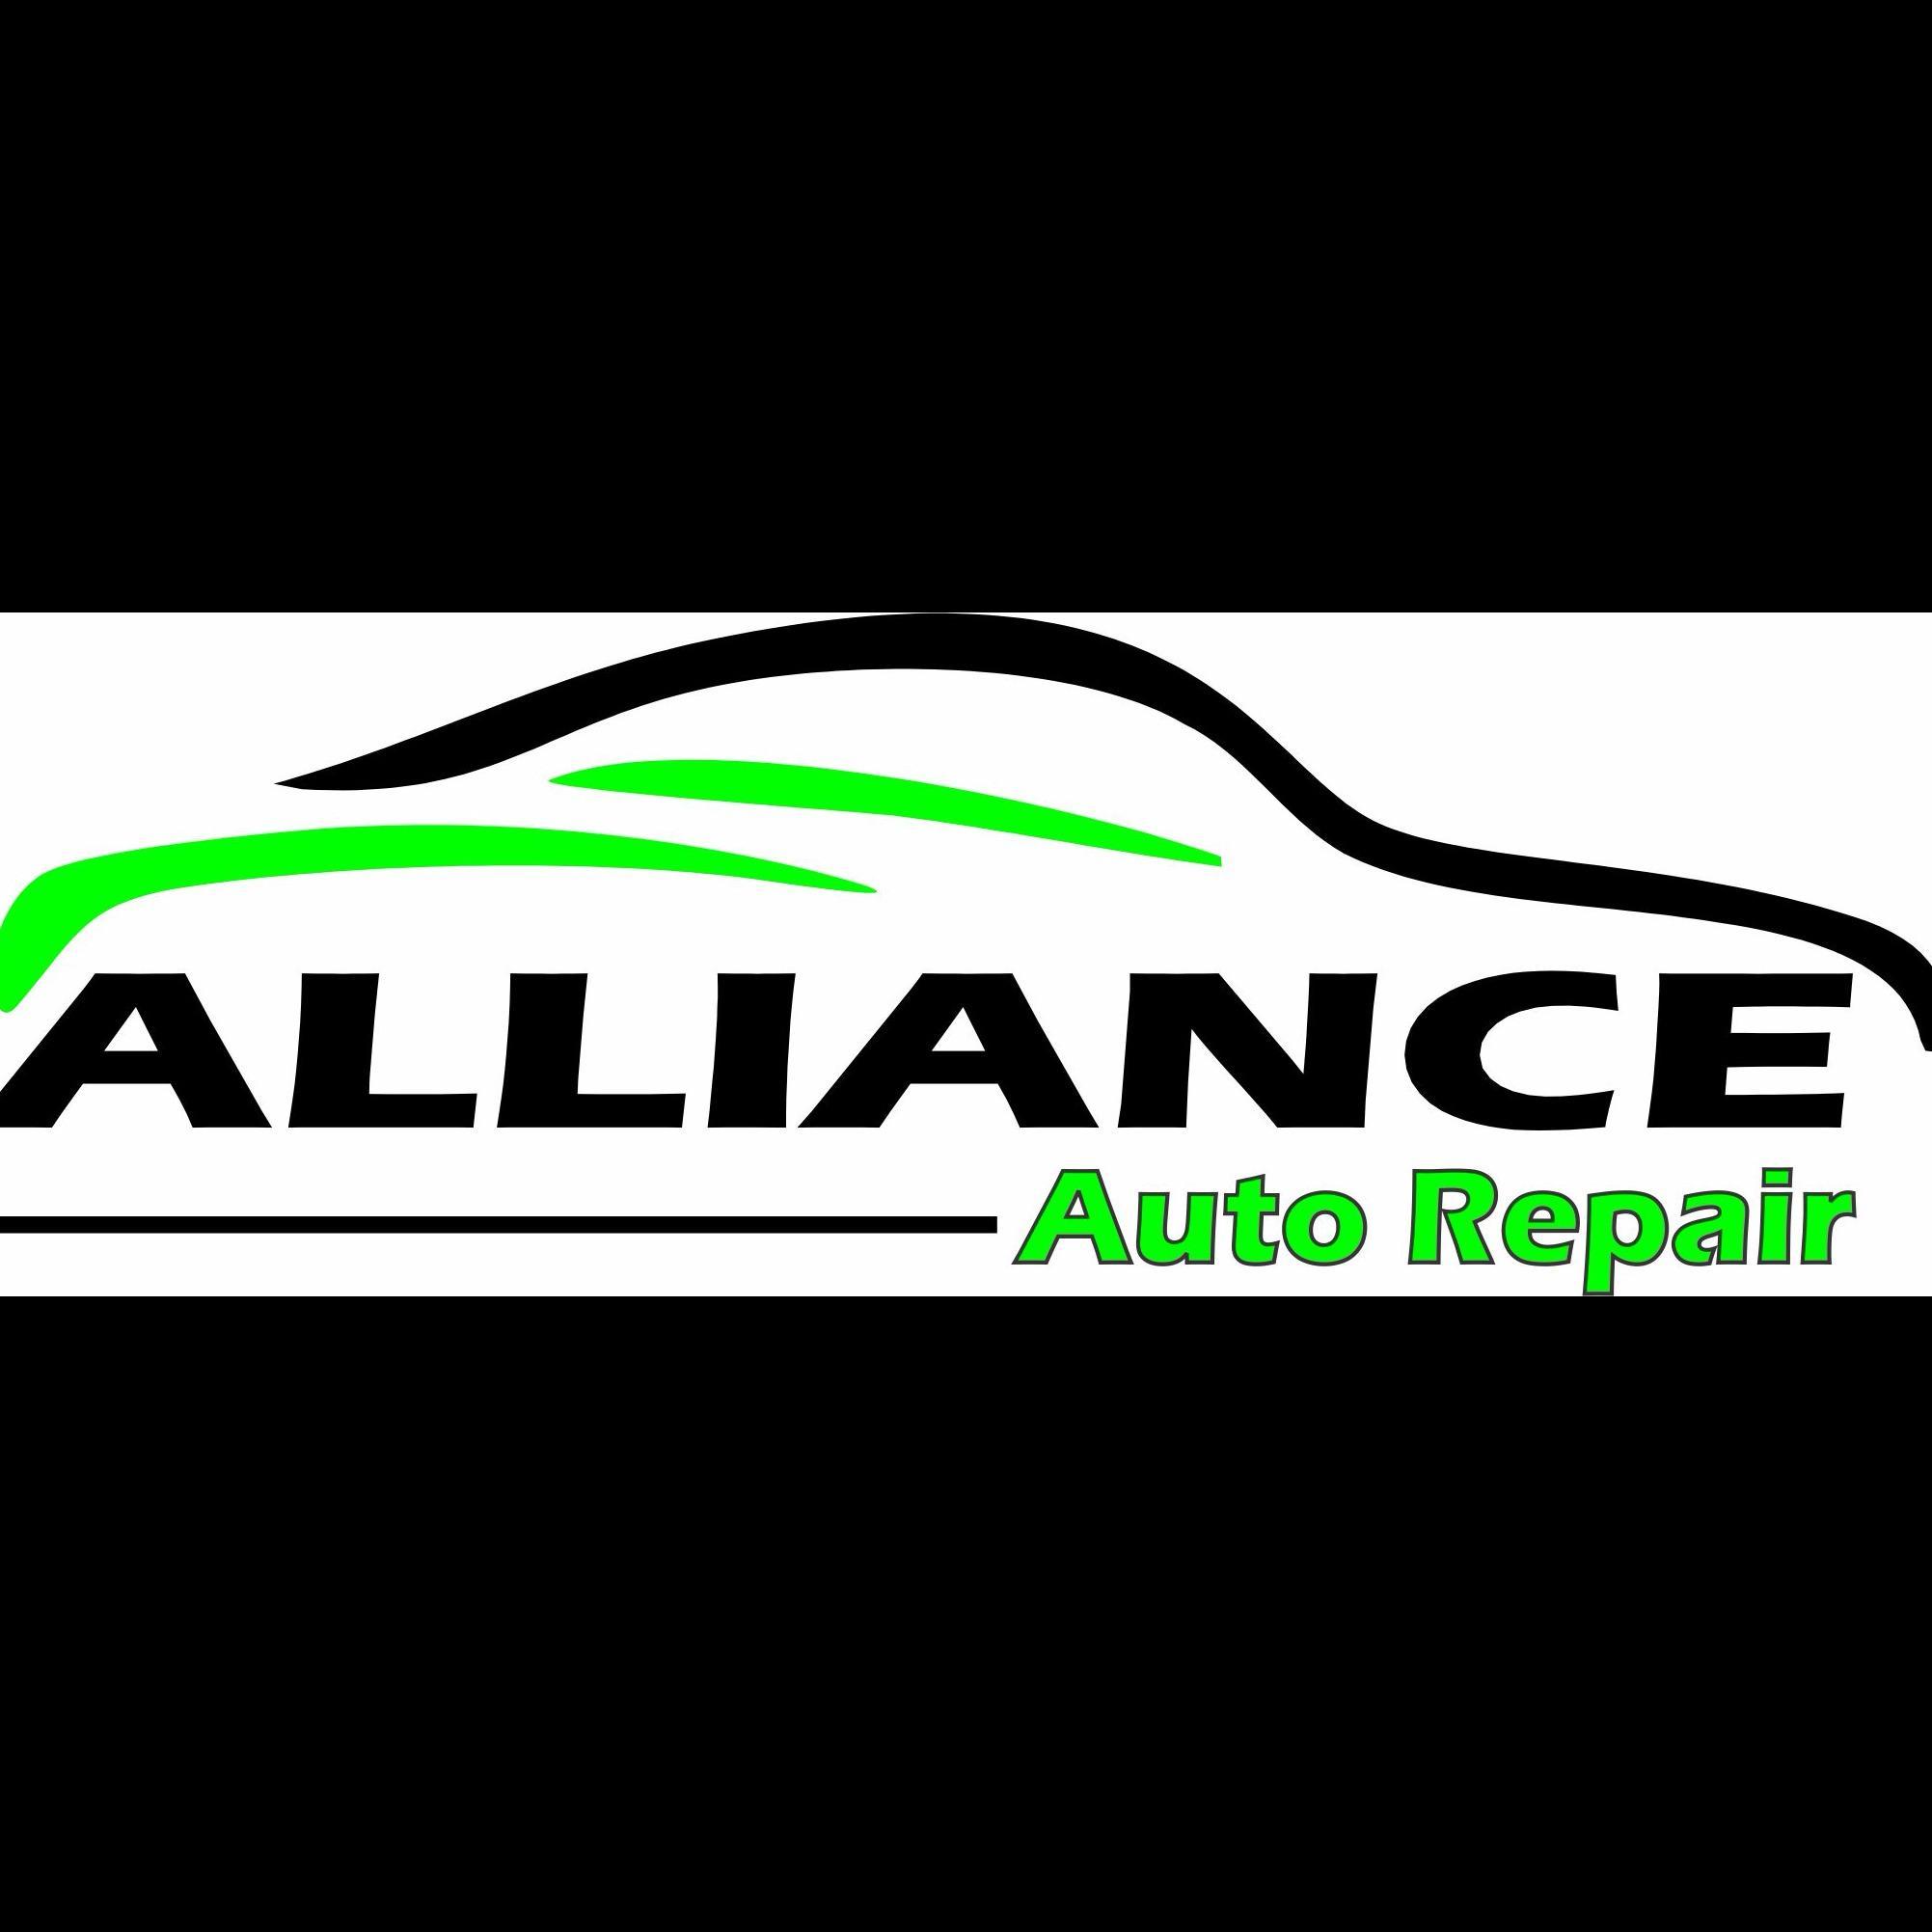 alliance auto repair port charlotte florida fl. Black Bedroom Furniture Sets. Home Design Ideas